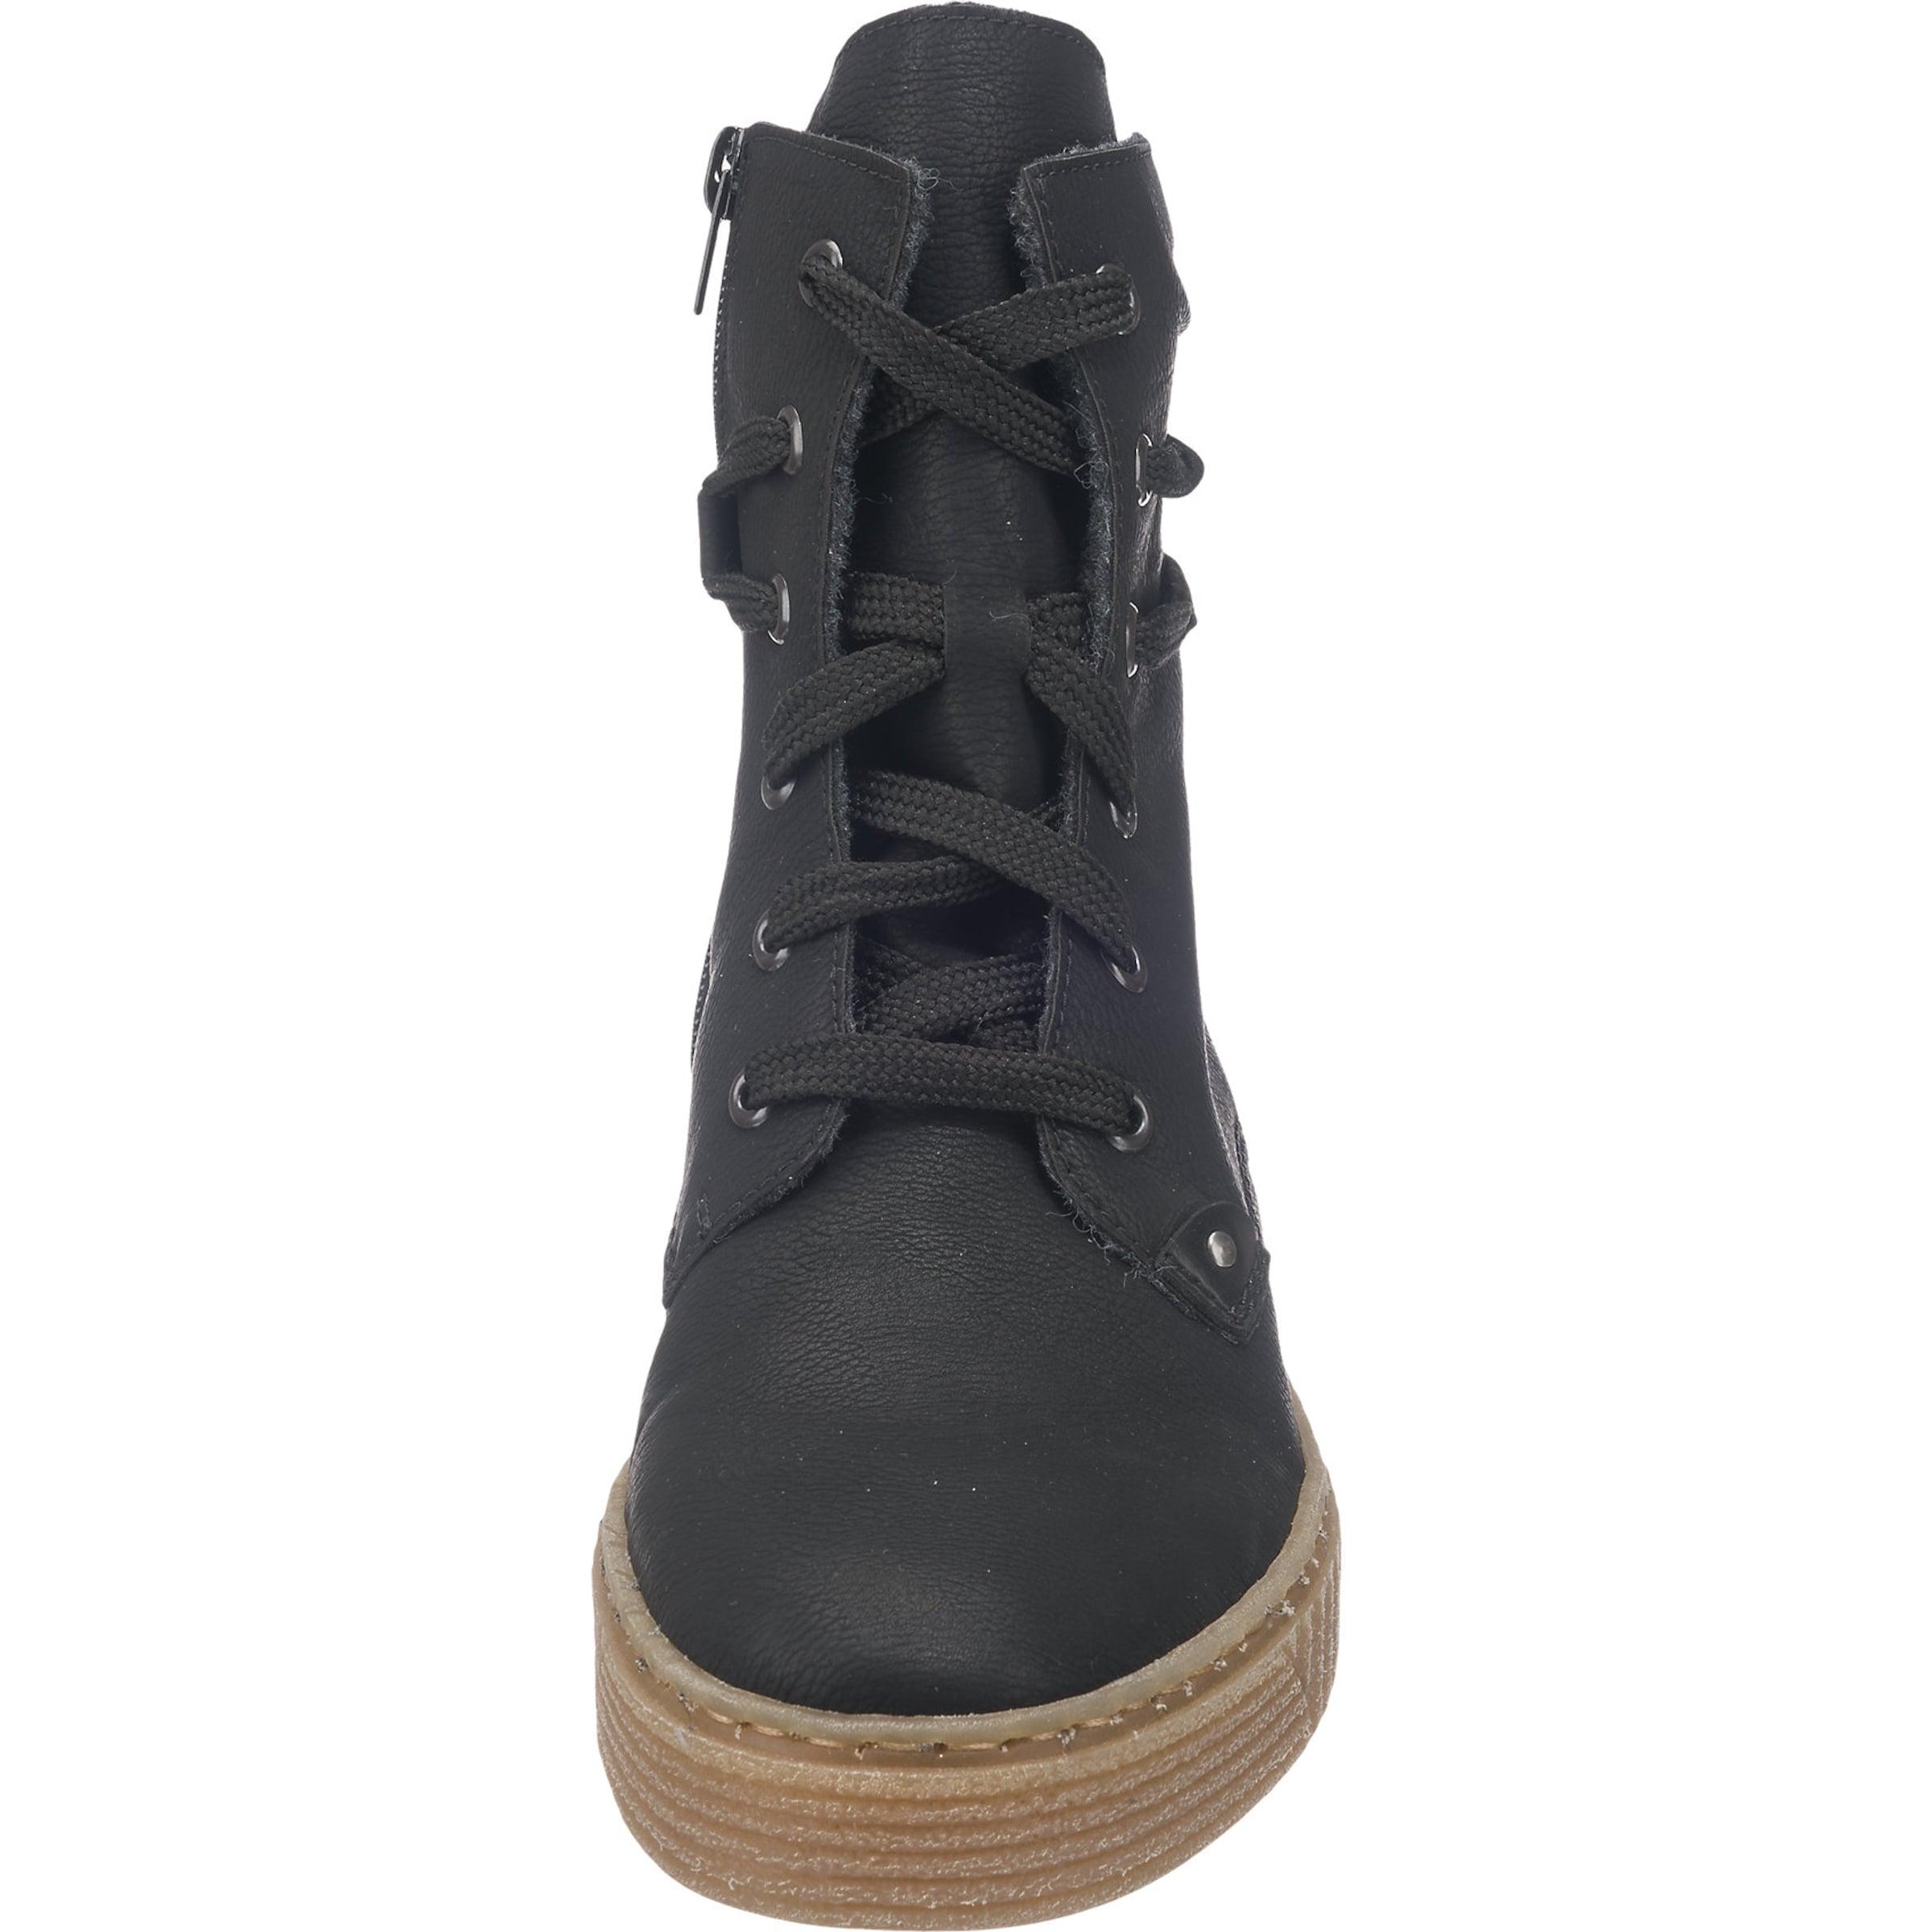 RIEKER RIEKER RIEKER Sneakers Sneakers Sneakers qBfpnUUO0